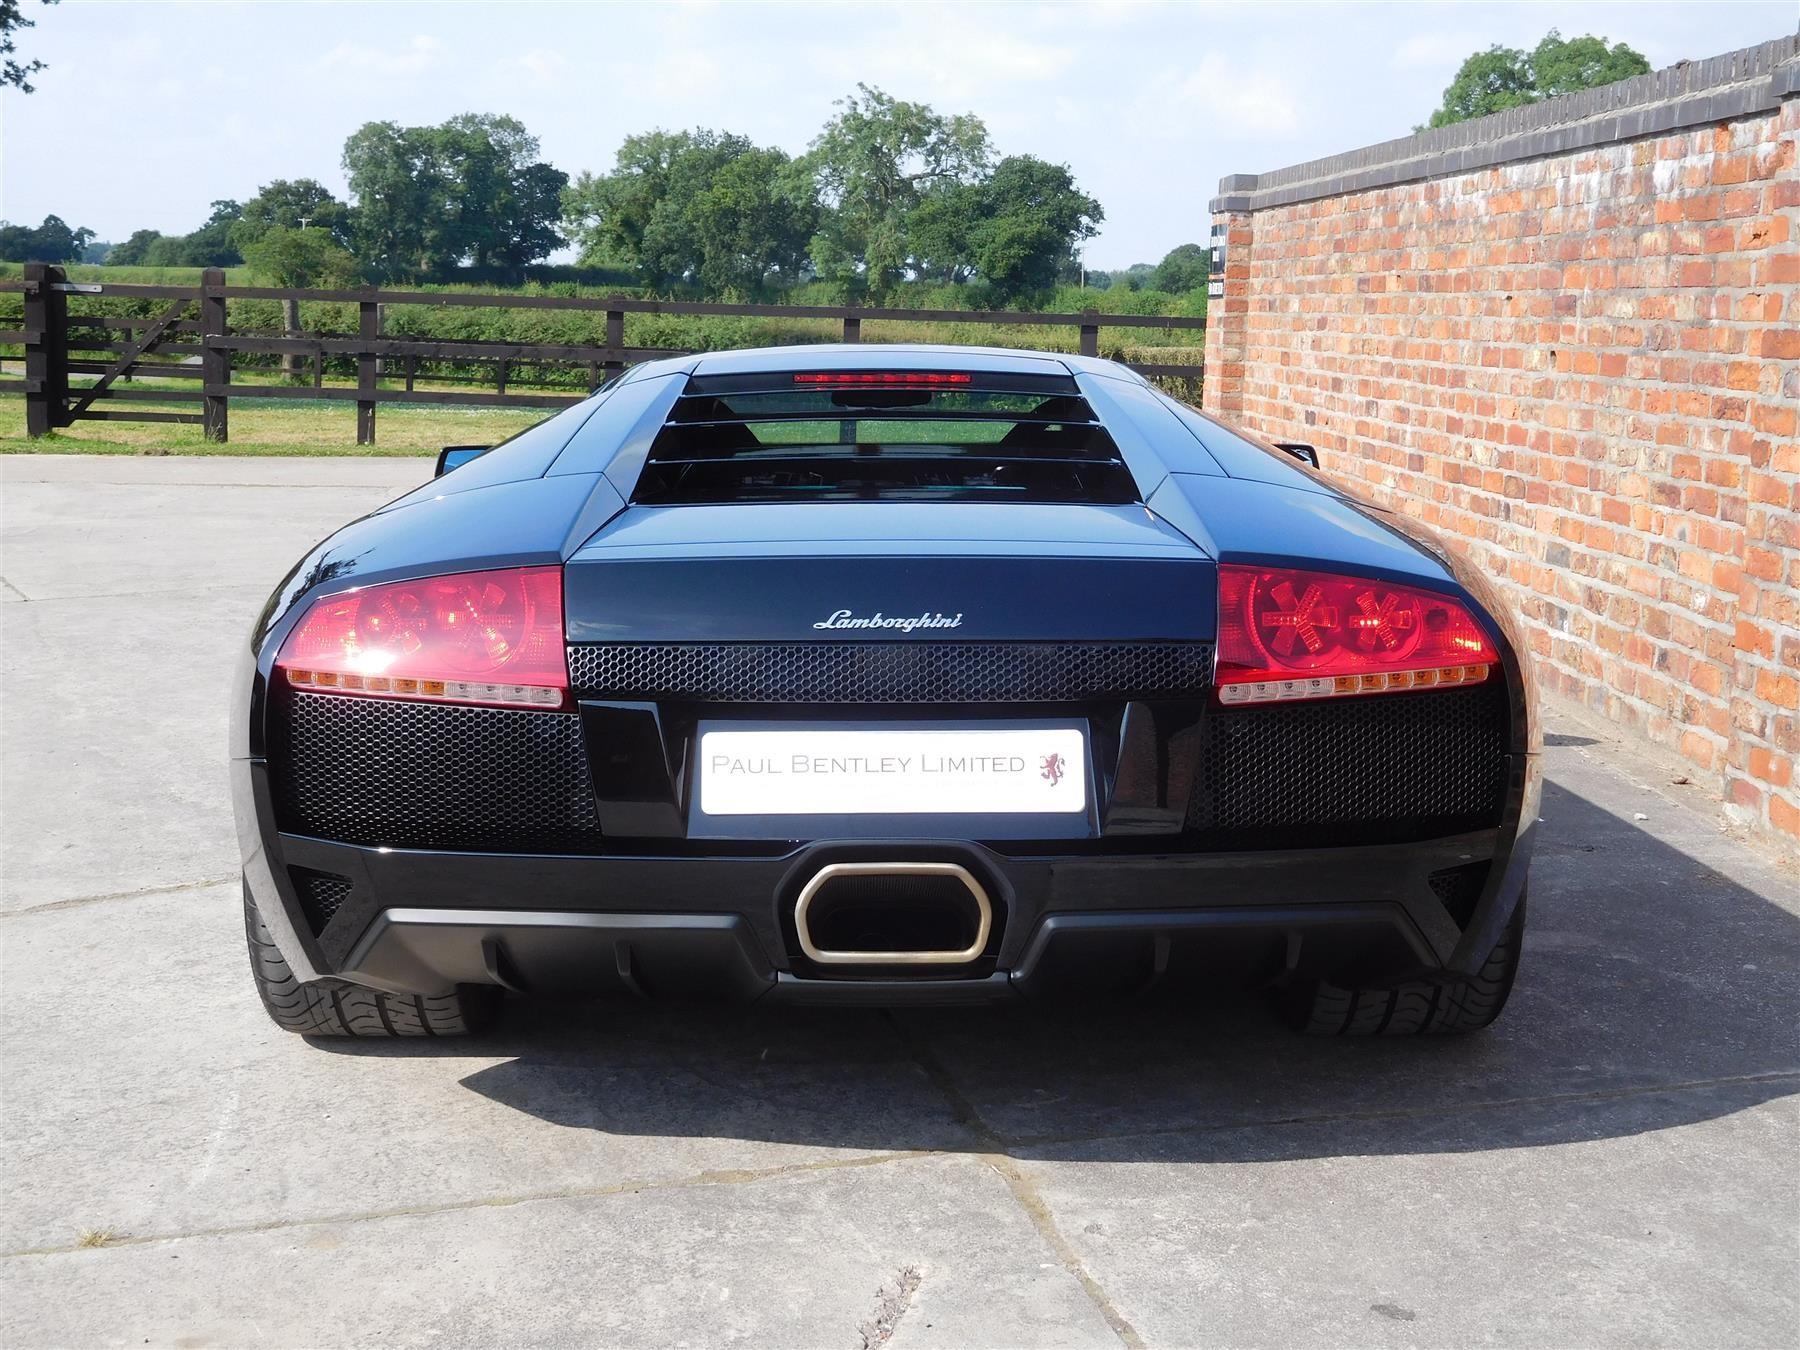 2007_Lamborghini_Murcielago_sale-0005